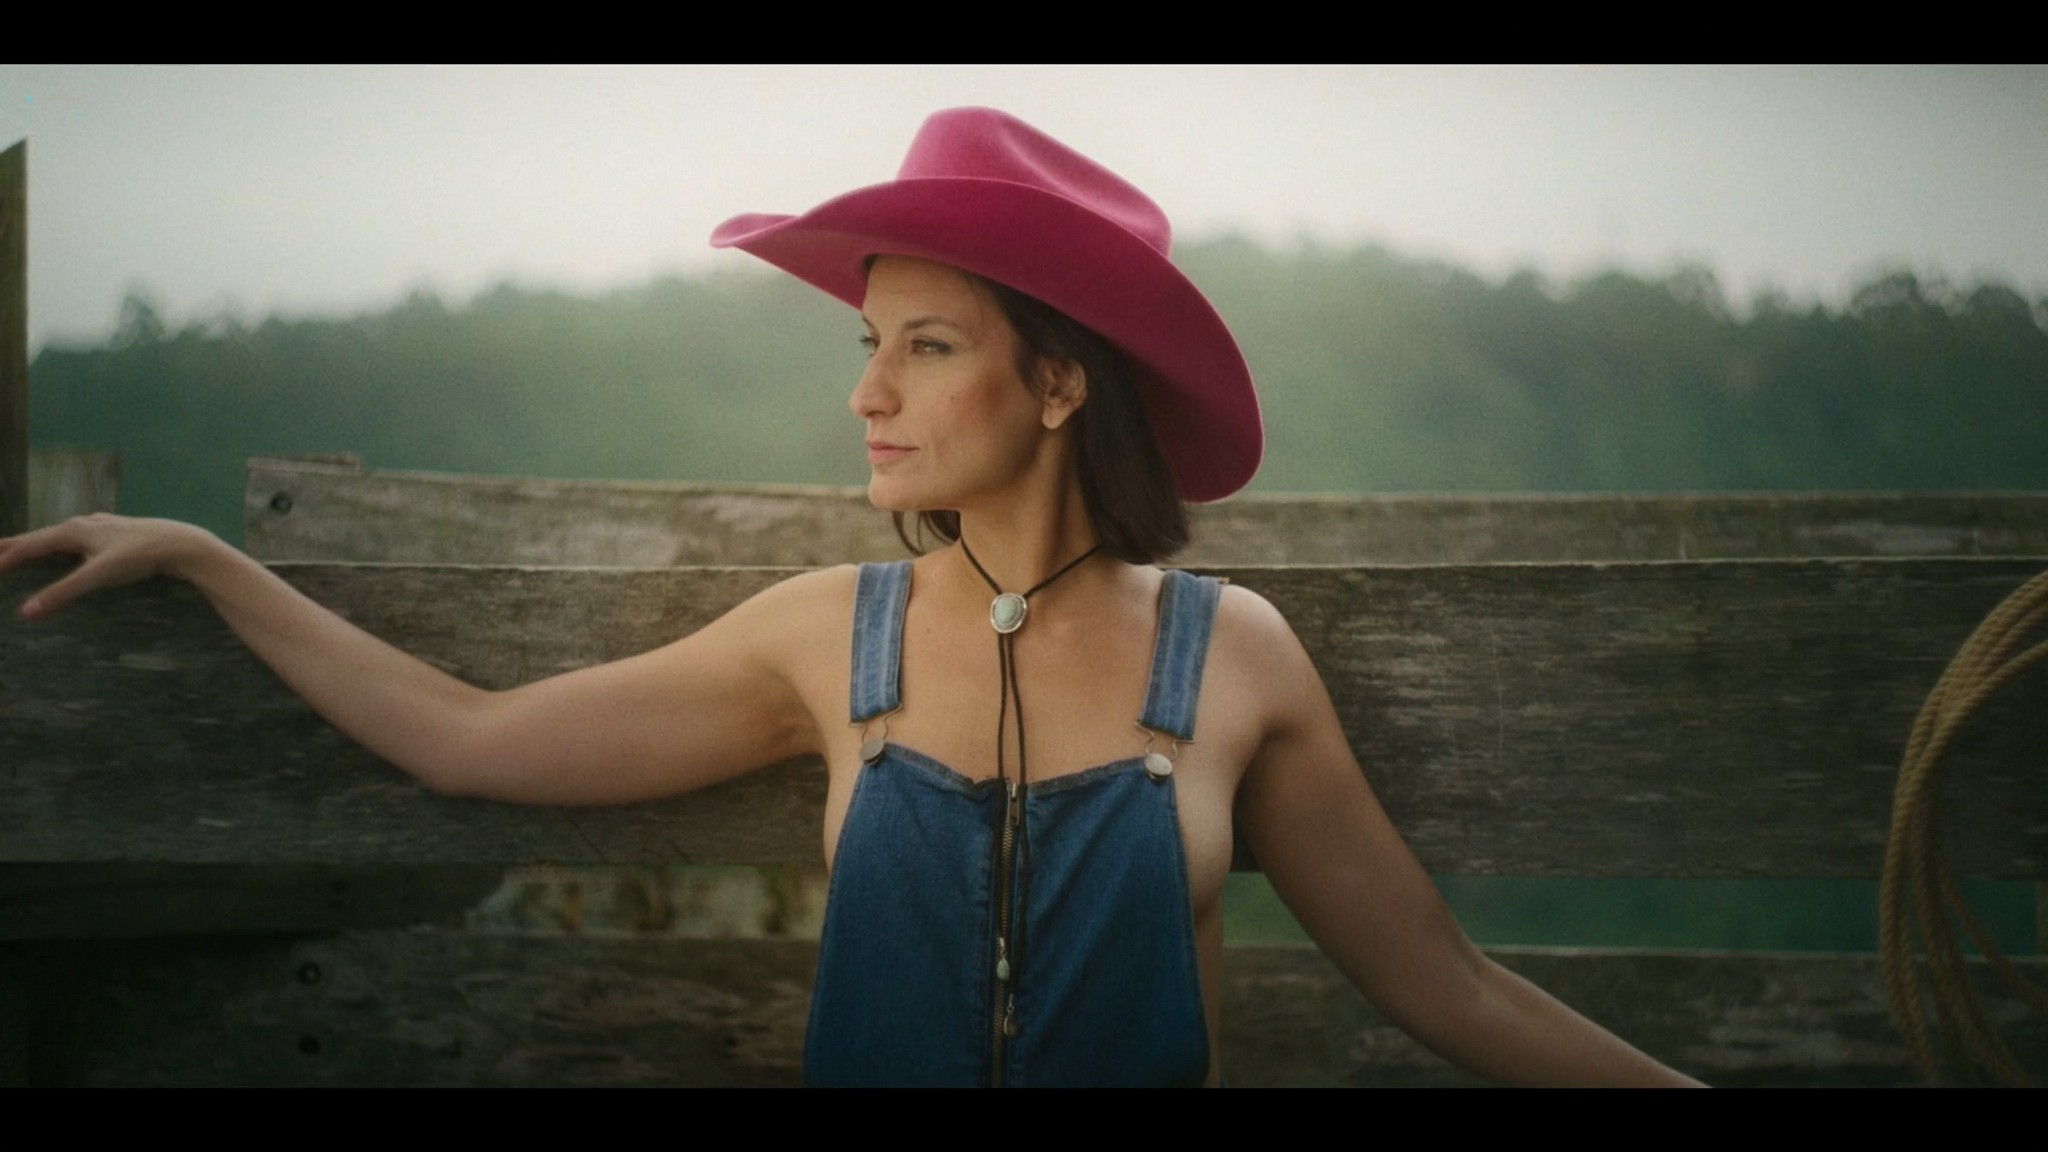 Natalia Lage nude sex Brunna Martins Juliana Bebe and oters nude too Hard 2021 s2e4 6 1080p Web 7